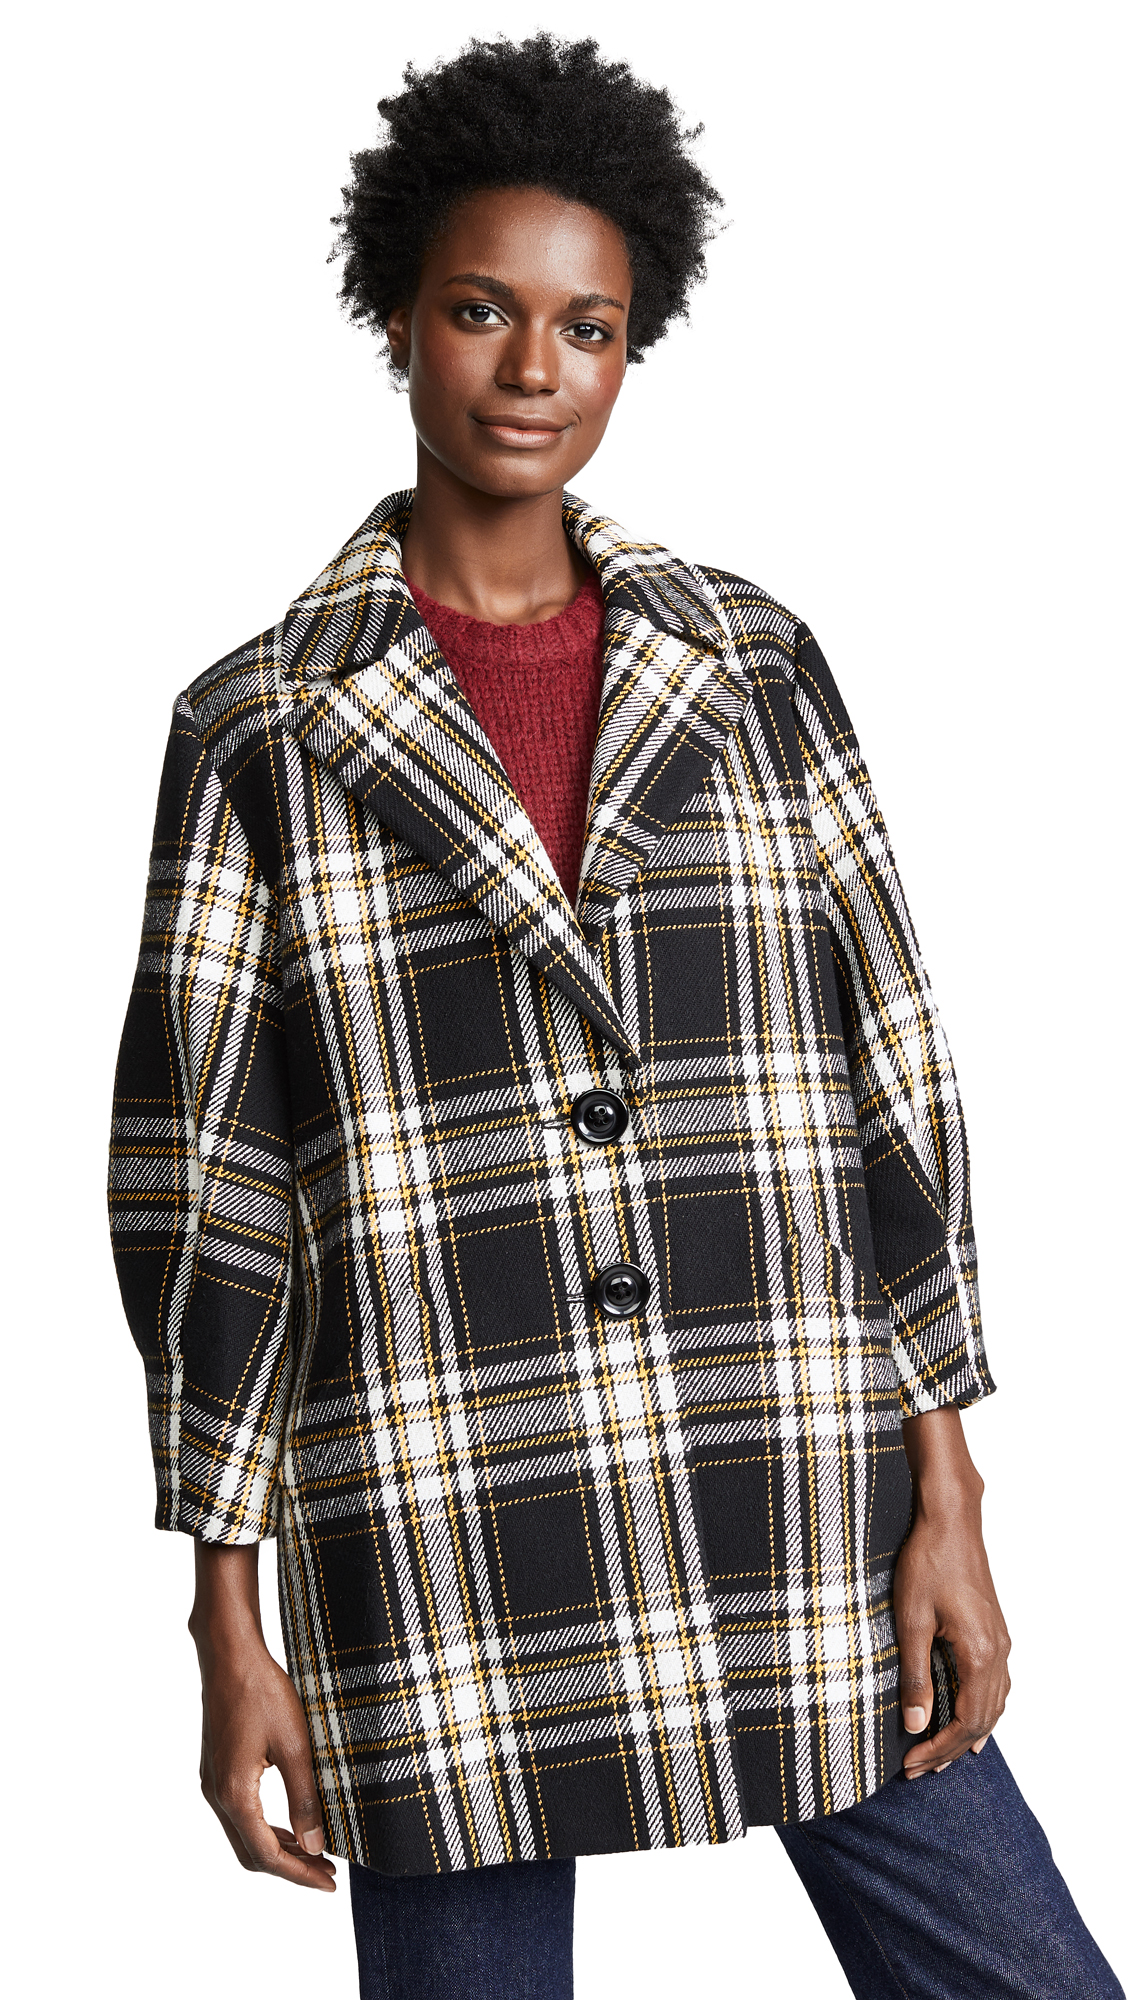 alice + olivia Lance Oversized Coat In Black/Yellow